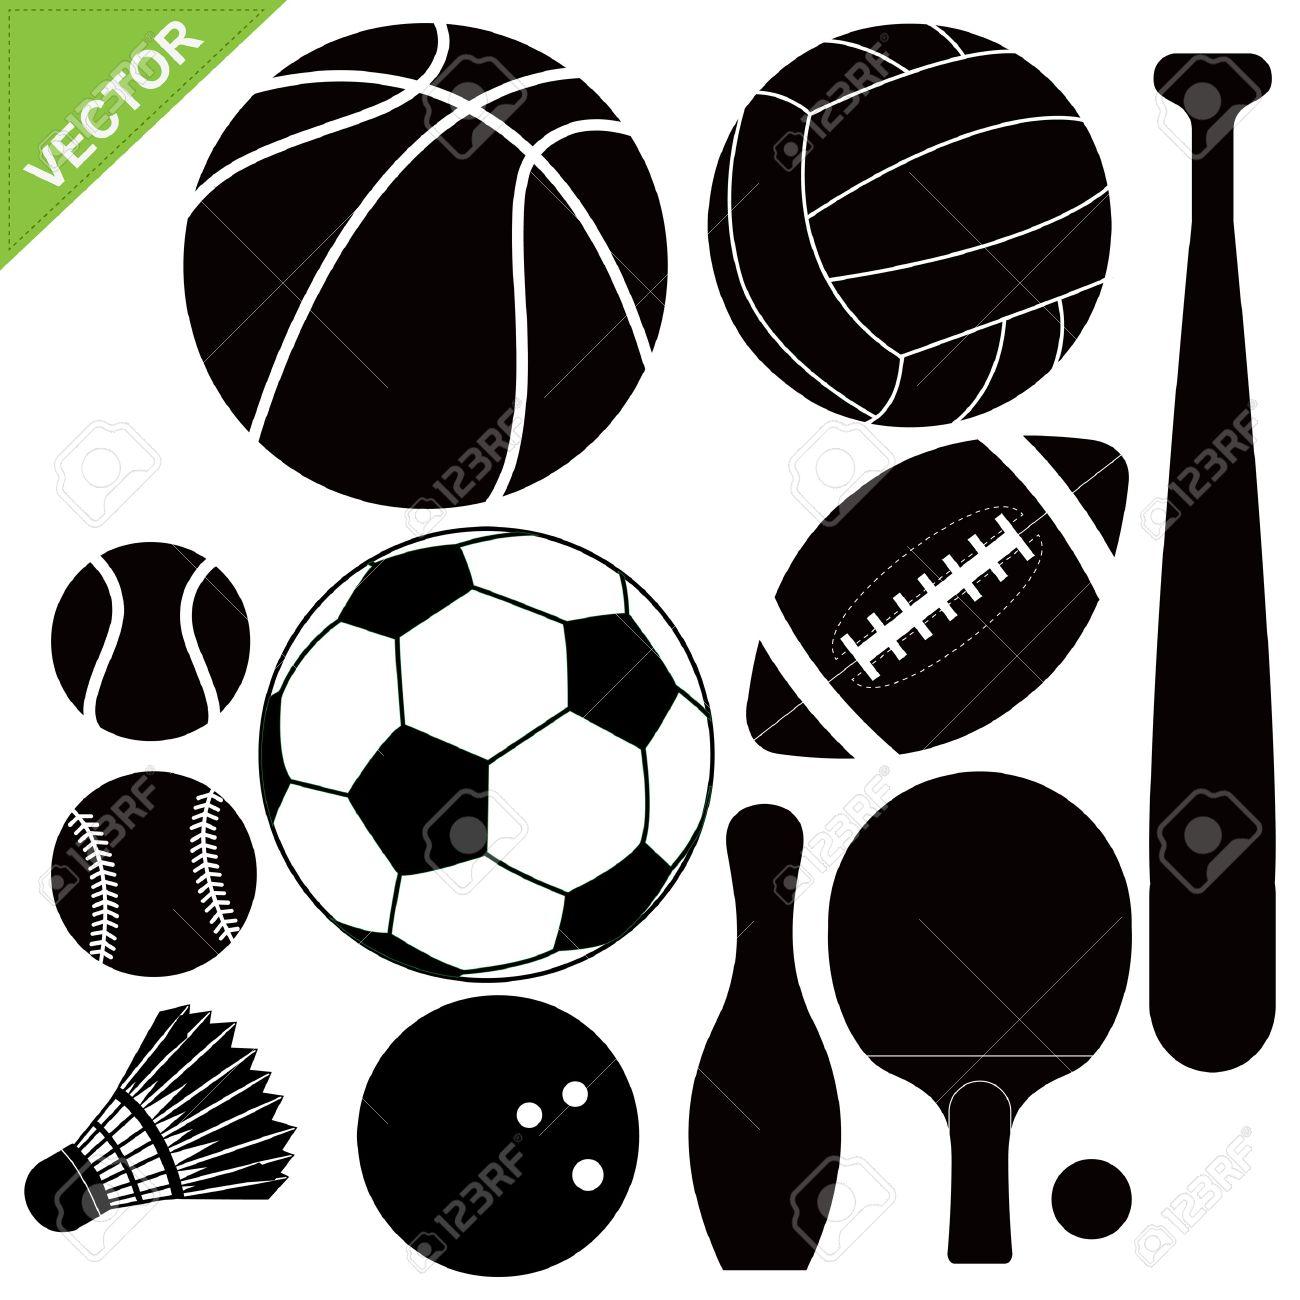 Sport equipment silhouettes Stock Vector - 15222035